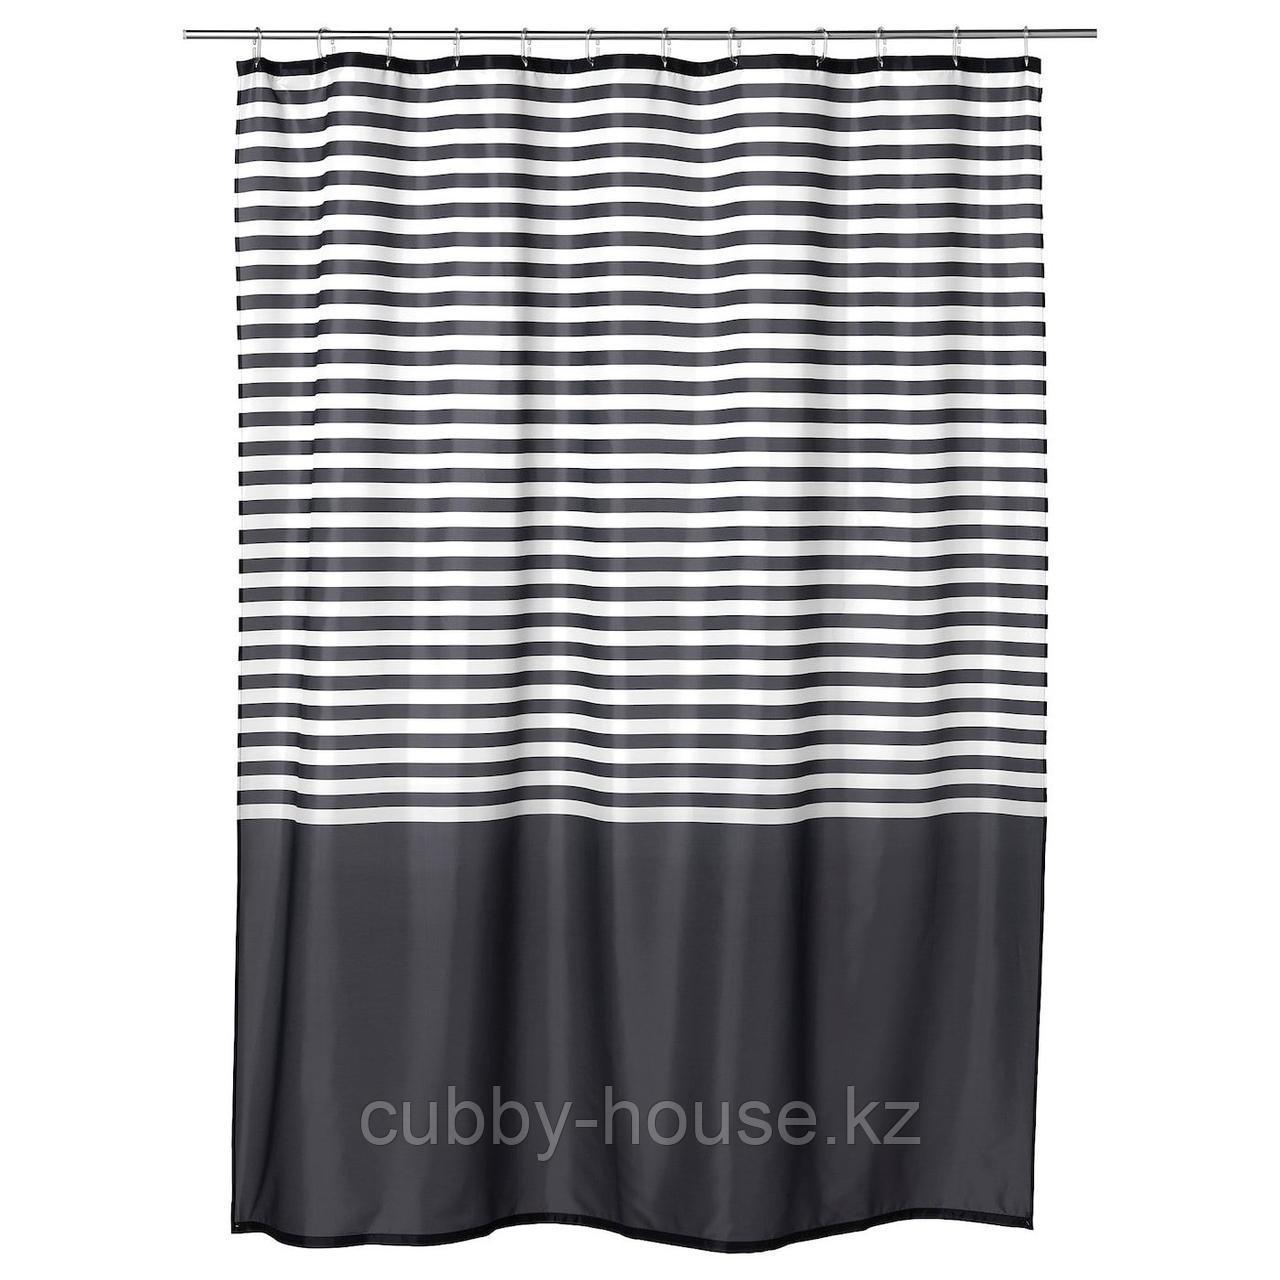 ВАДШЁН Штора для ванной, темно-серый, 180x200 см